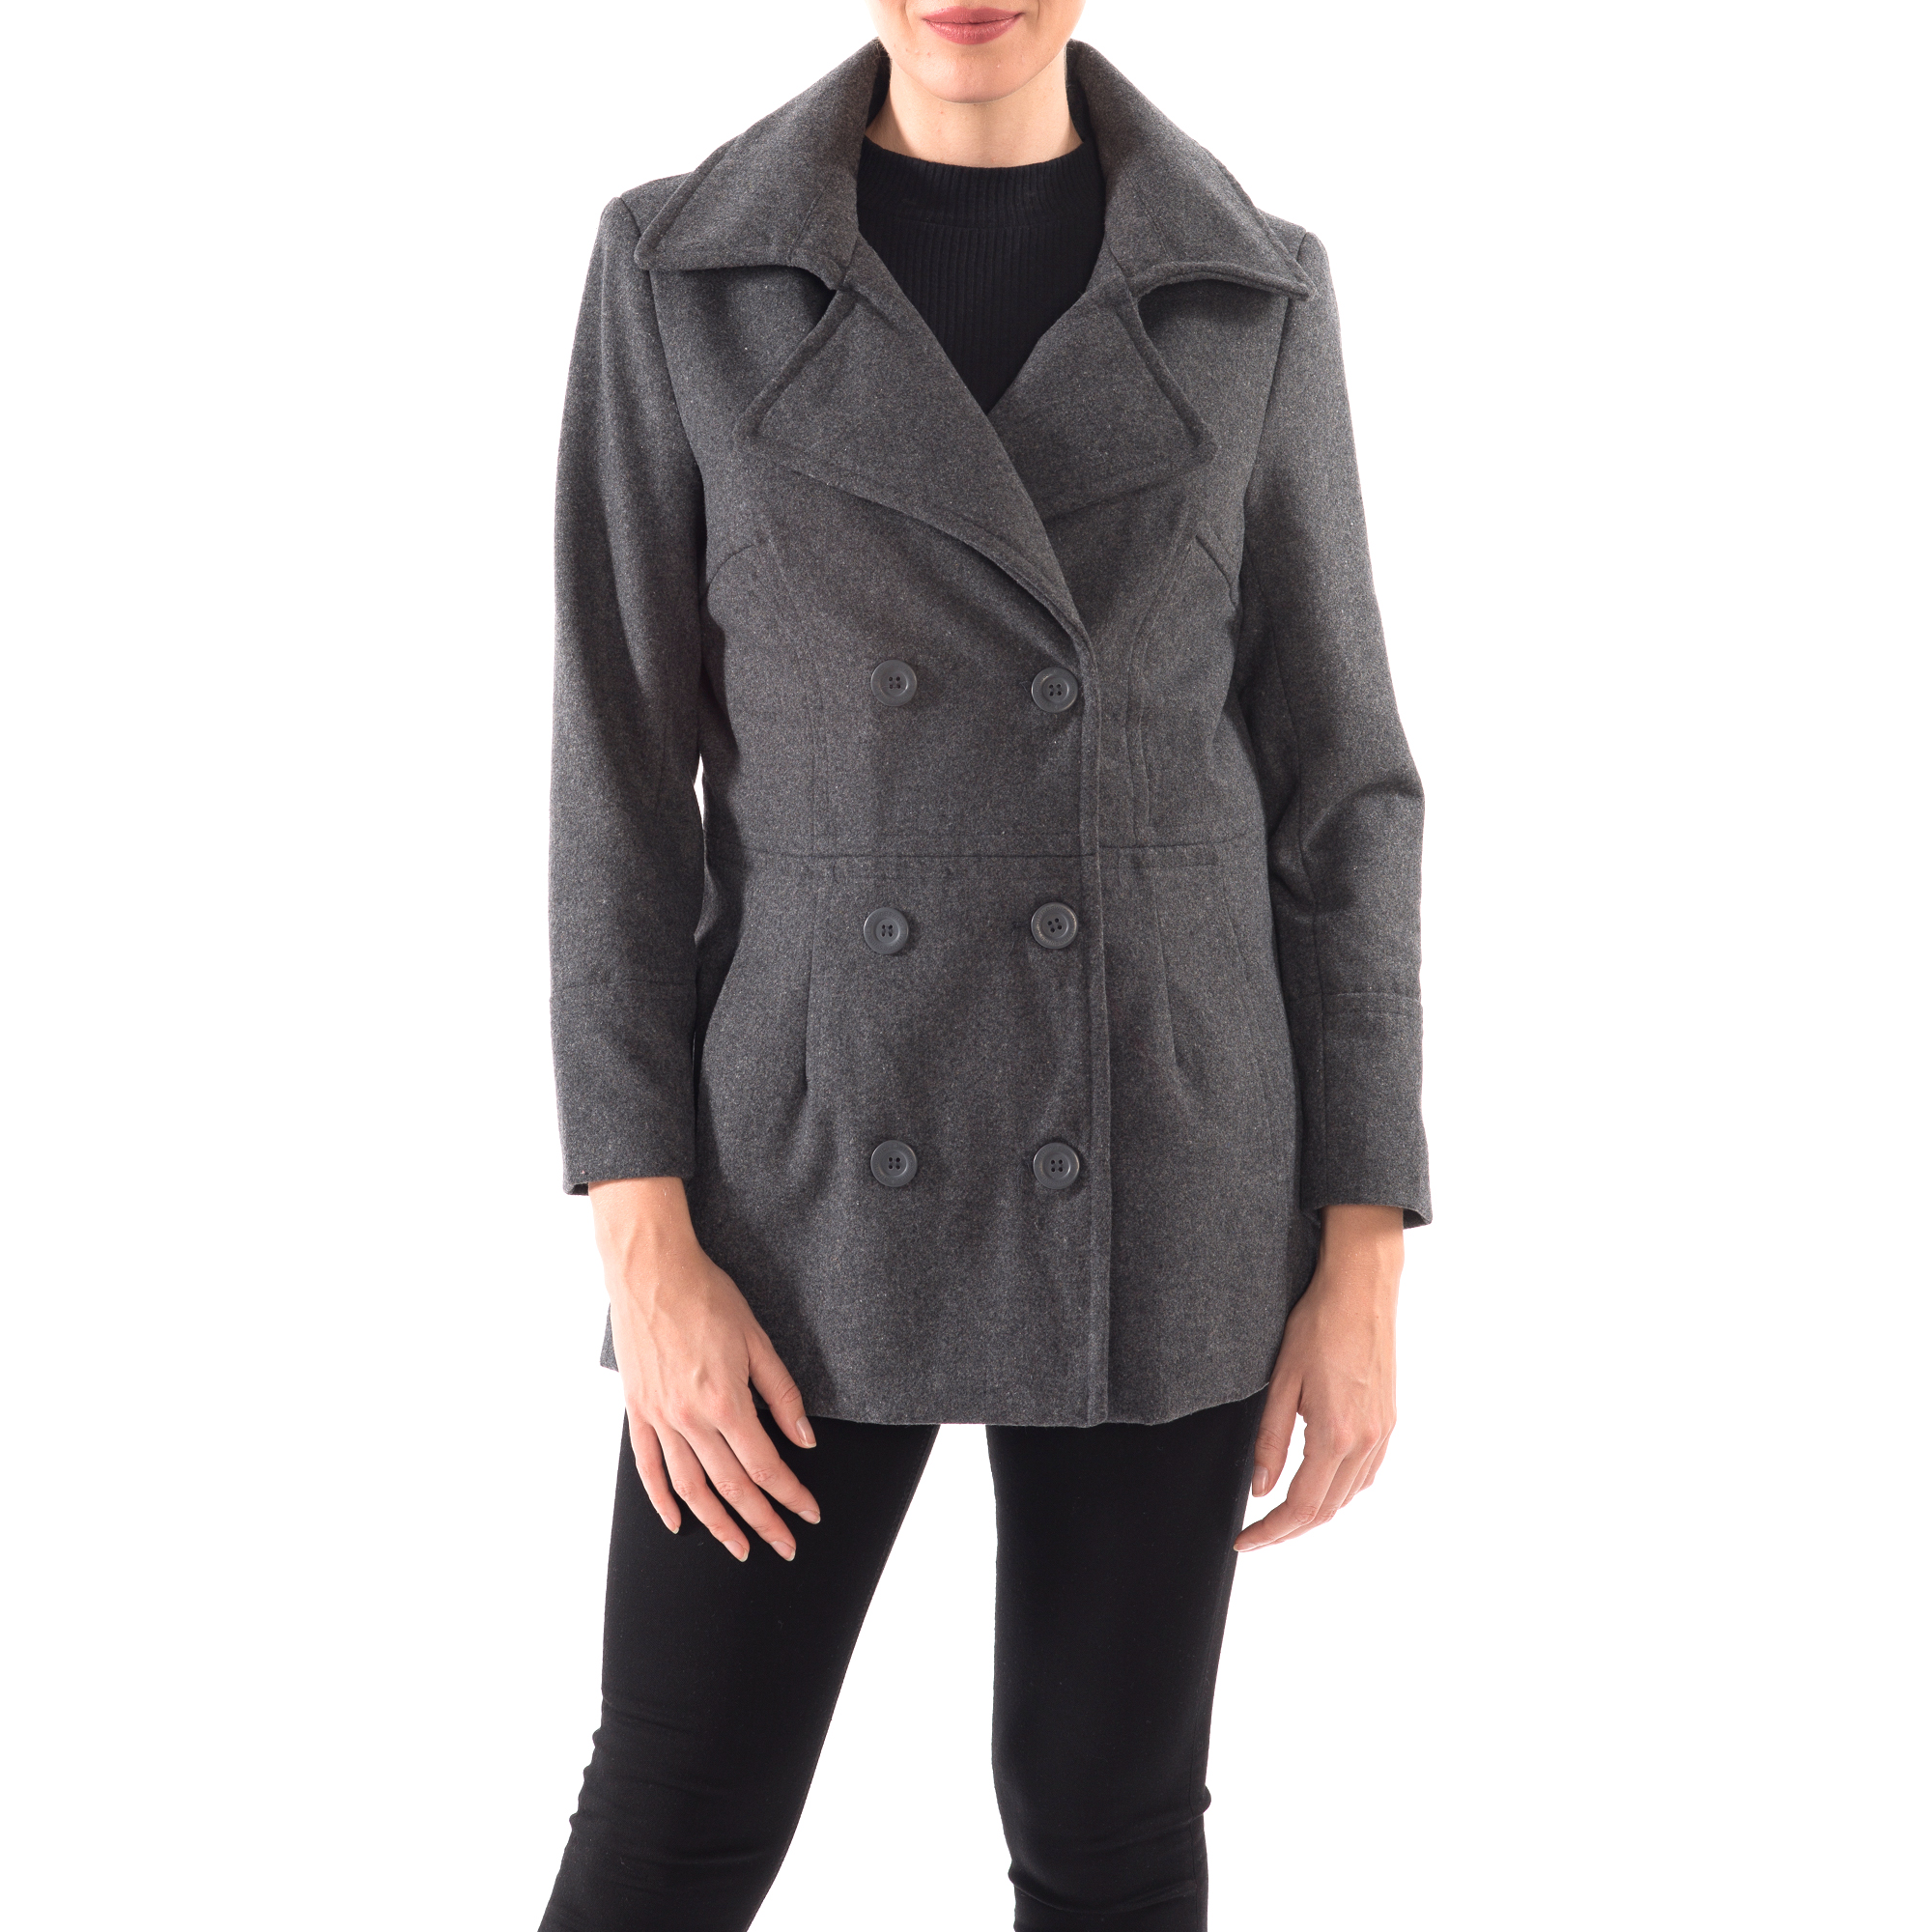 Alpine-Swiss-Emma-Womens-Peacoat-Jacket-Wool-Blazer-Double-Breasted-Overcoat-New thumbnail 43